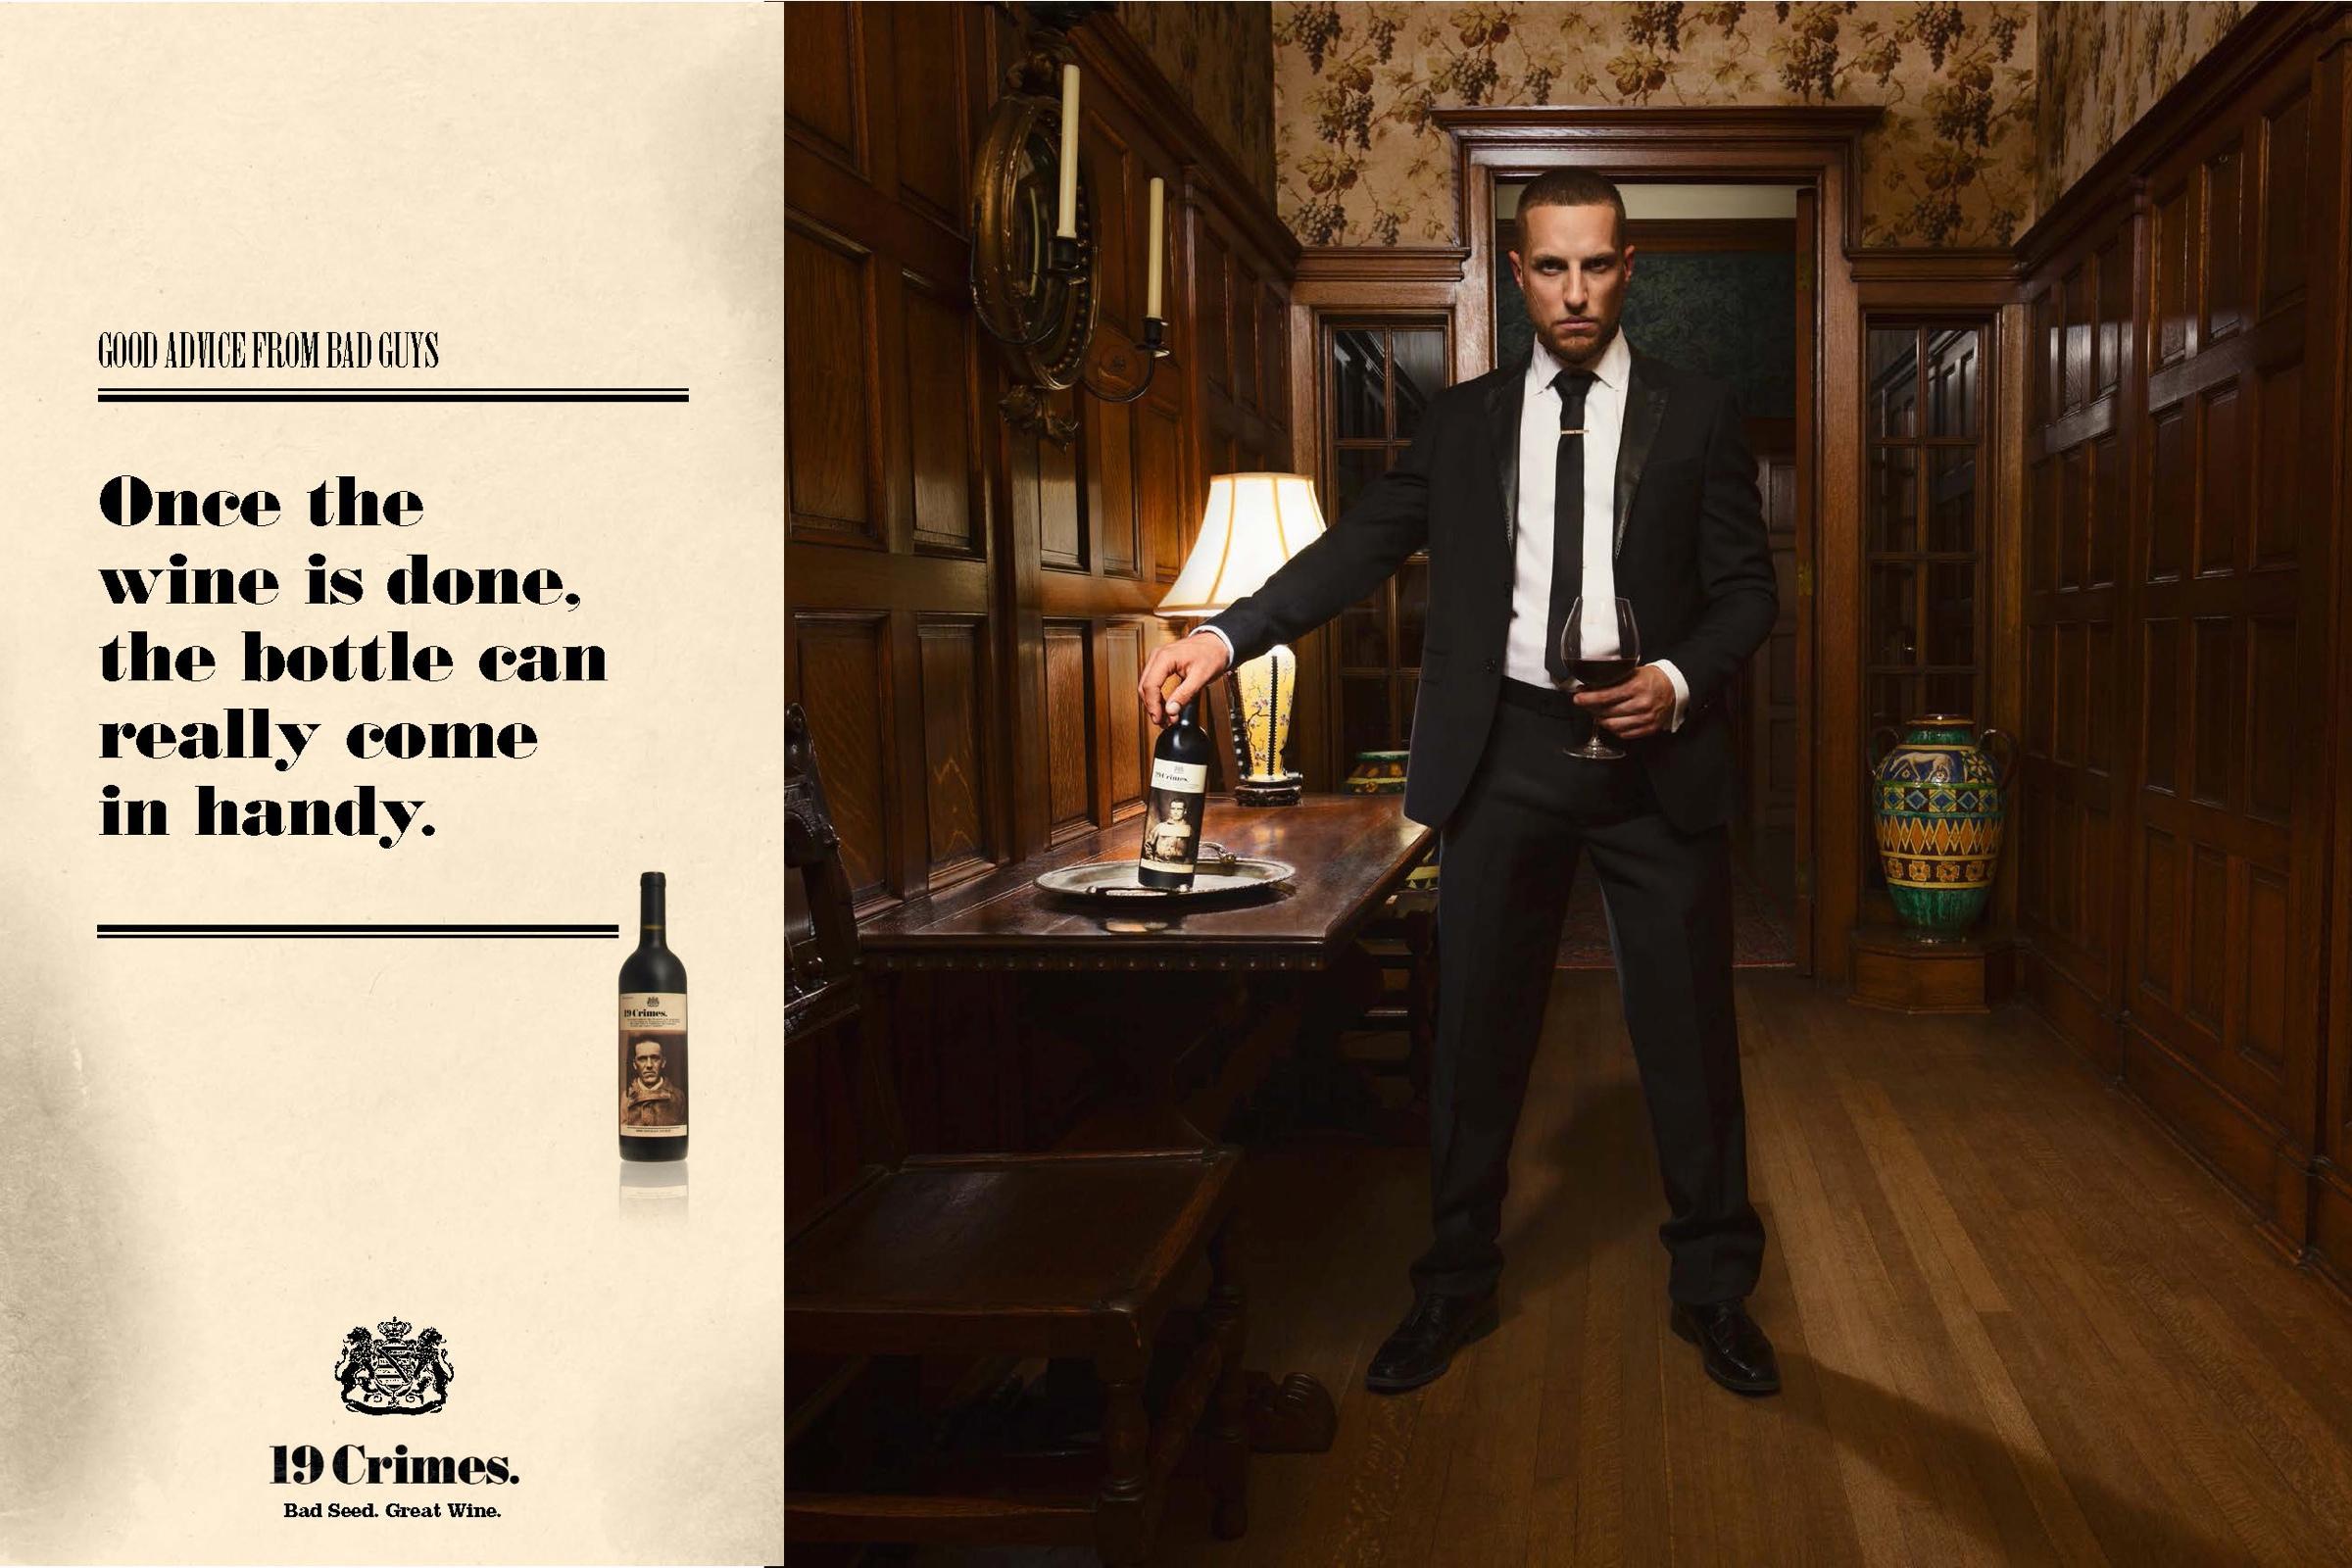 Treasury Wine Estates Print Ad -  Good advice from bad guys, 1